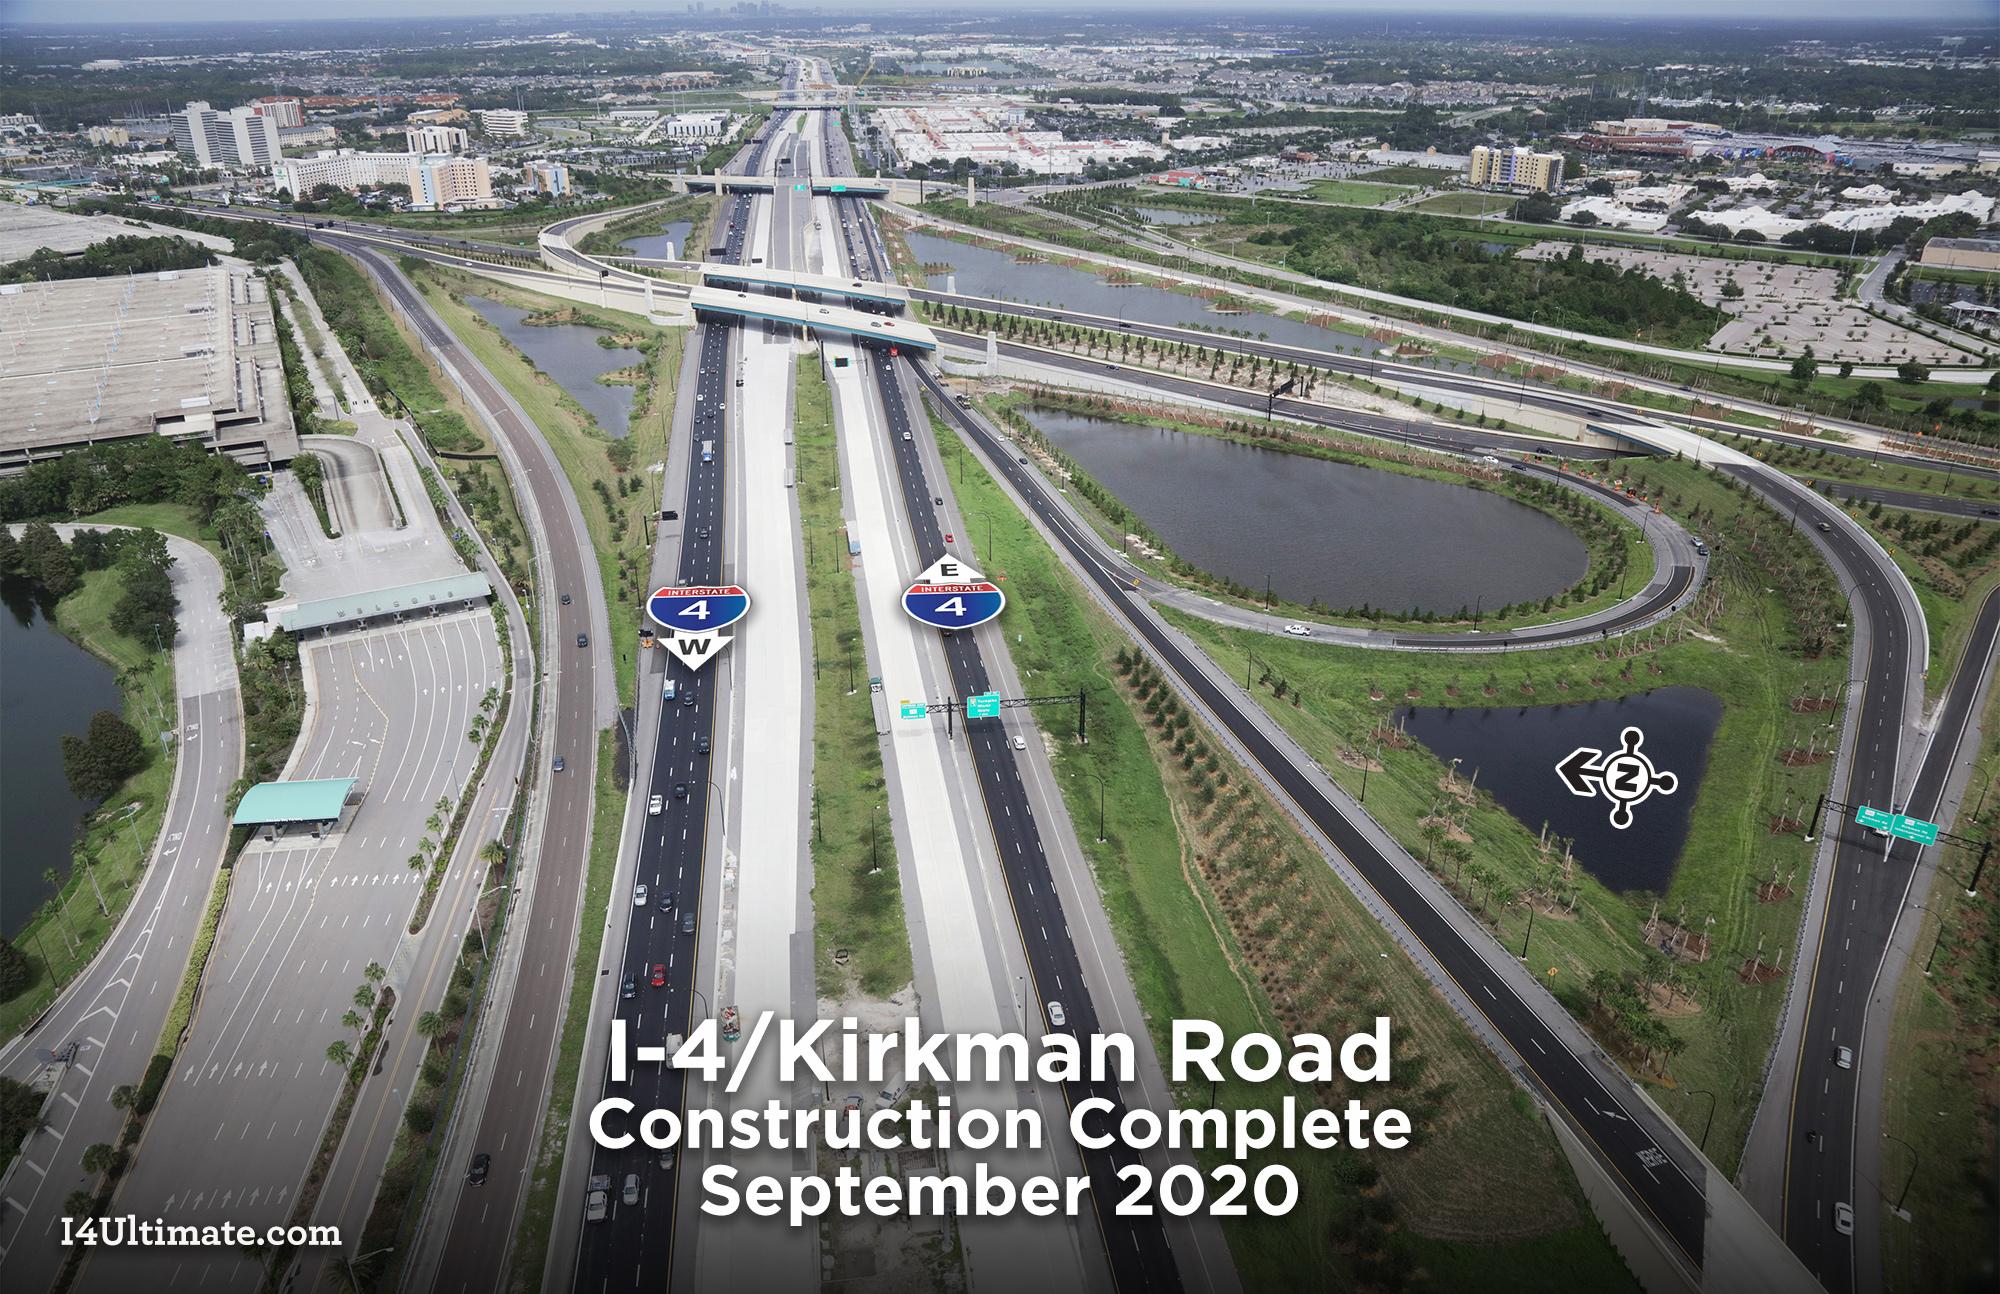 4573-I-4-Kirkman-Image-Construction-Complete-2020